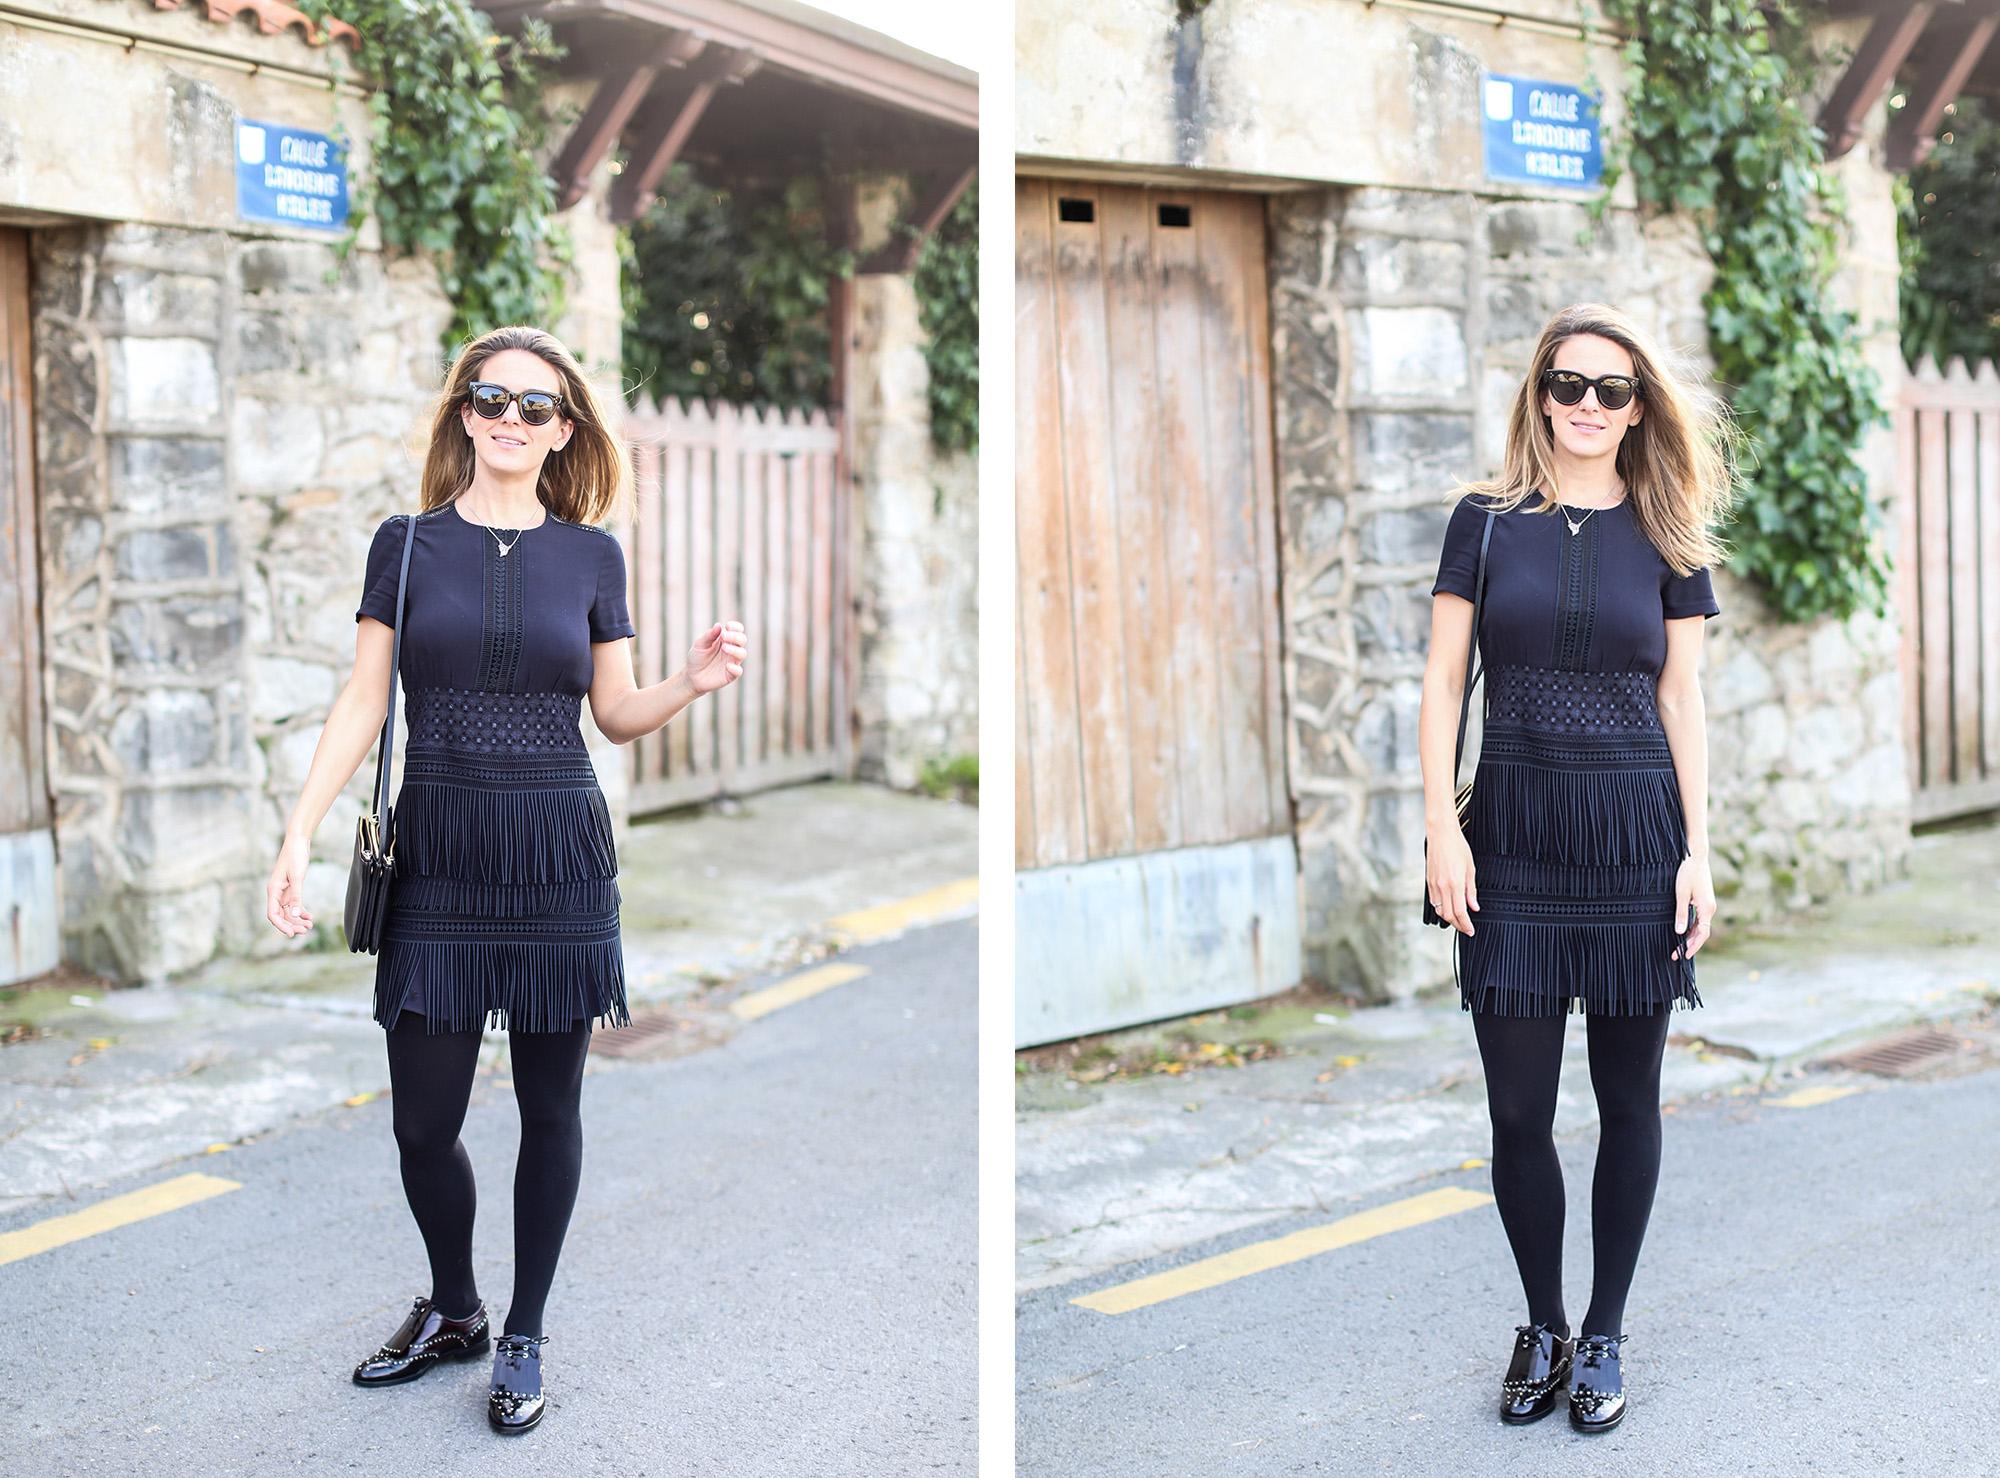 Clochet_streetstyle_fashionblogger_zapatosplanosbroguestachuelasPertini_vestidoMajeflecosReia-14